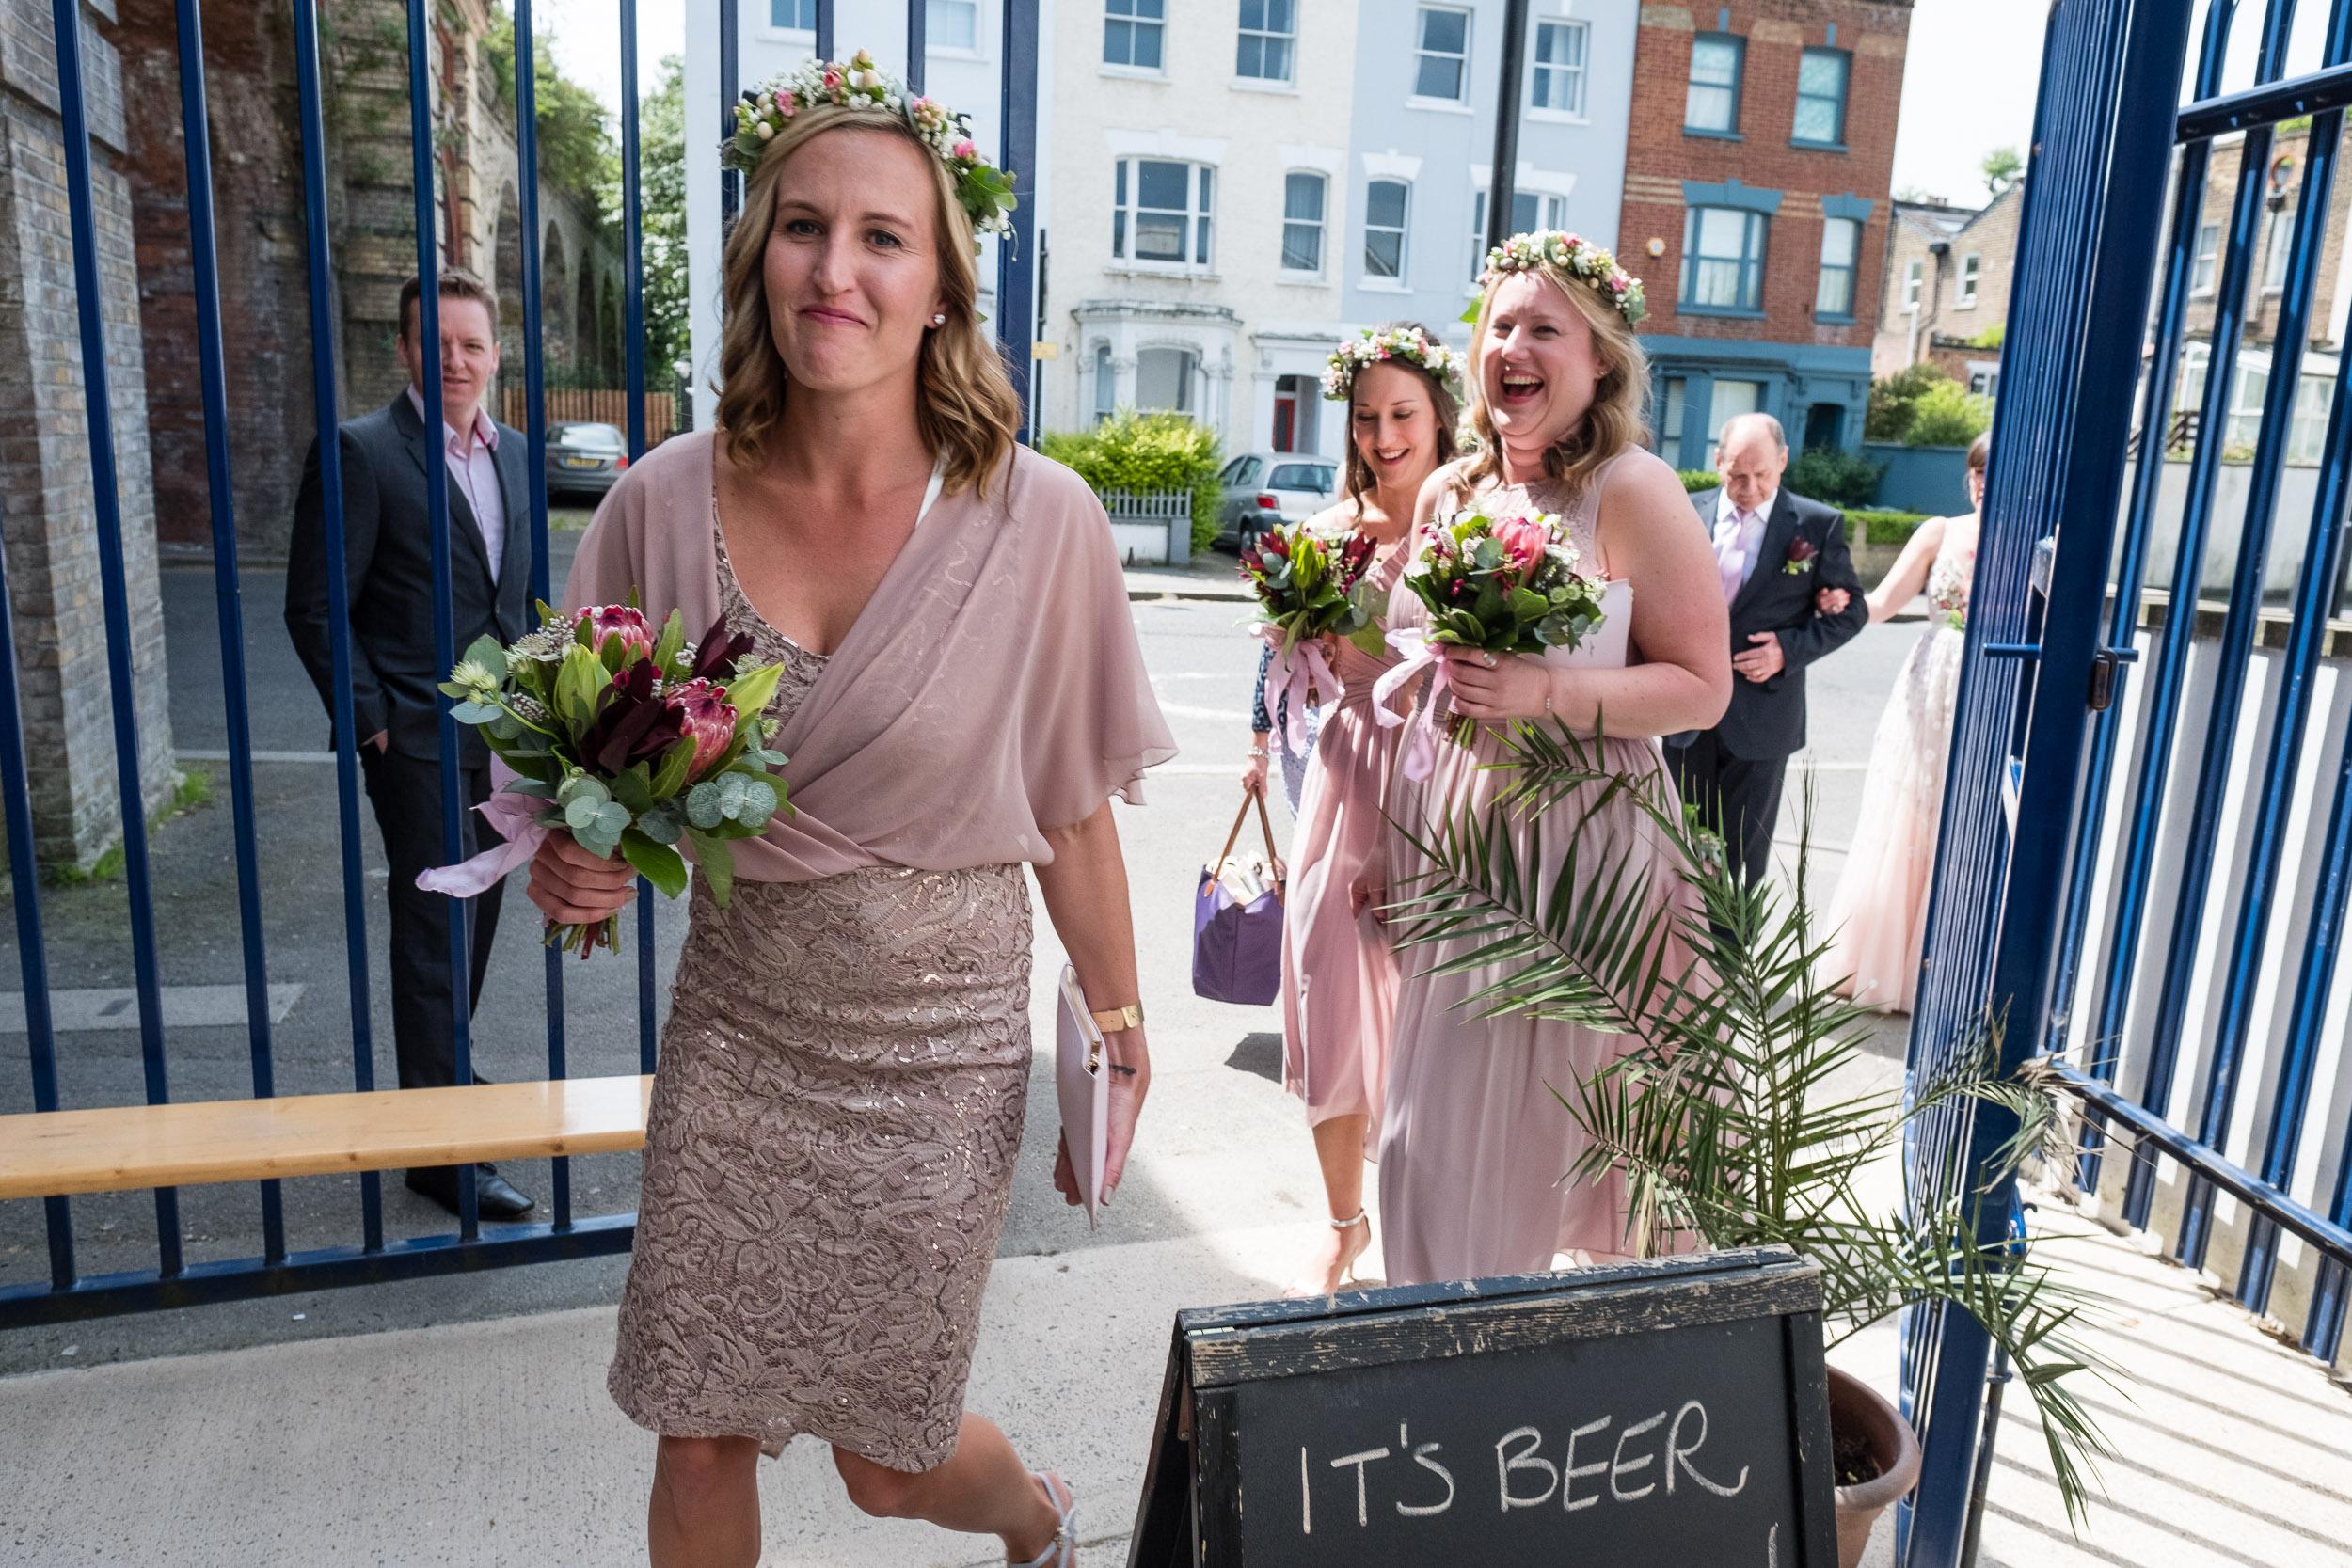 brockwell-lido-brixton-herne-hill-wedding-036.jpg